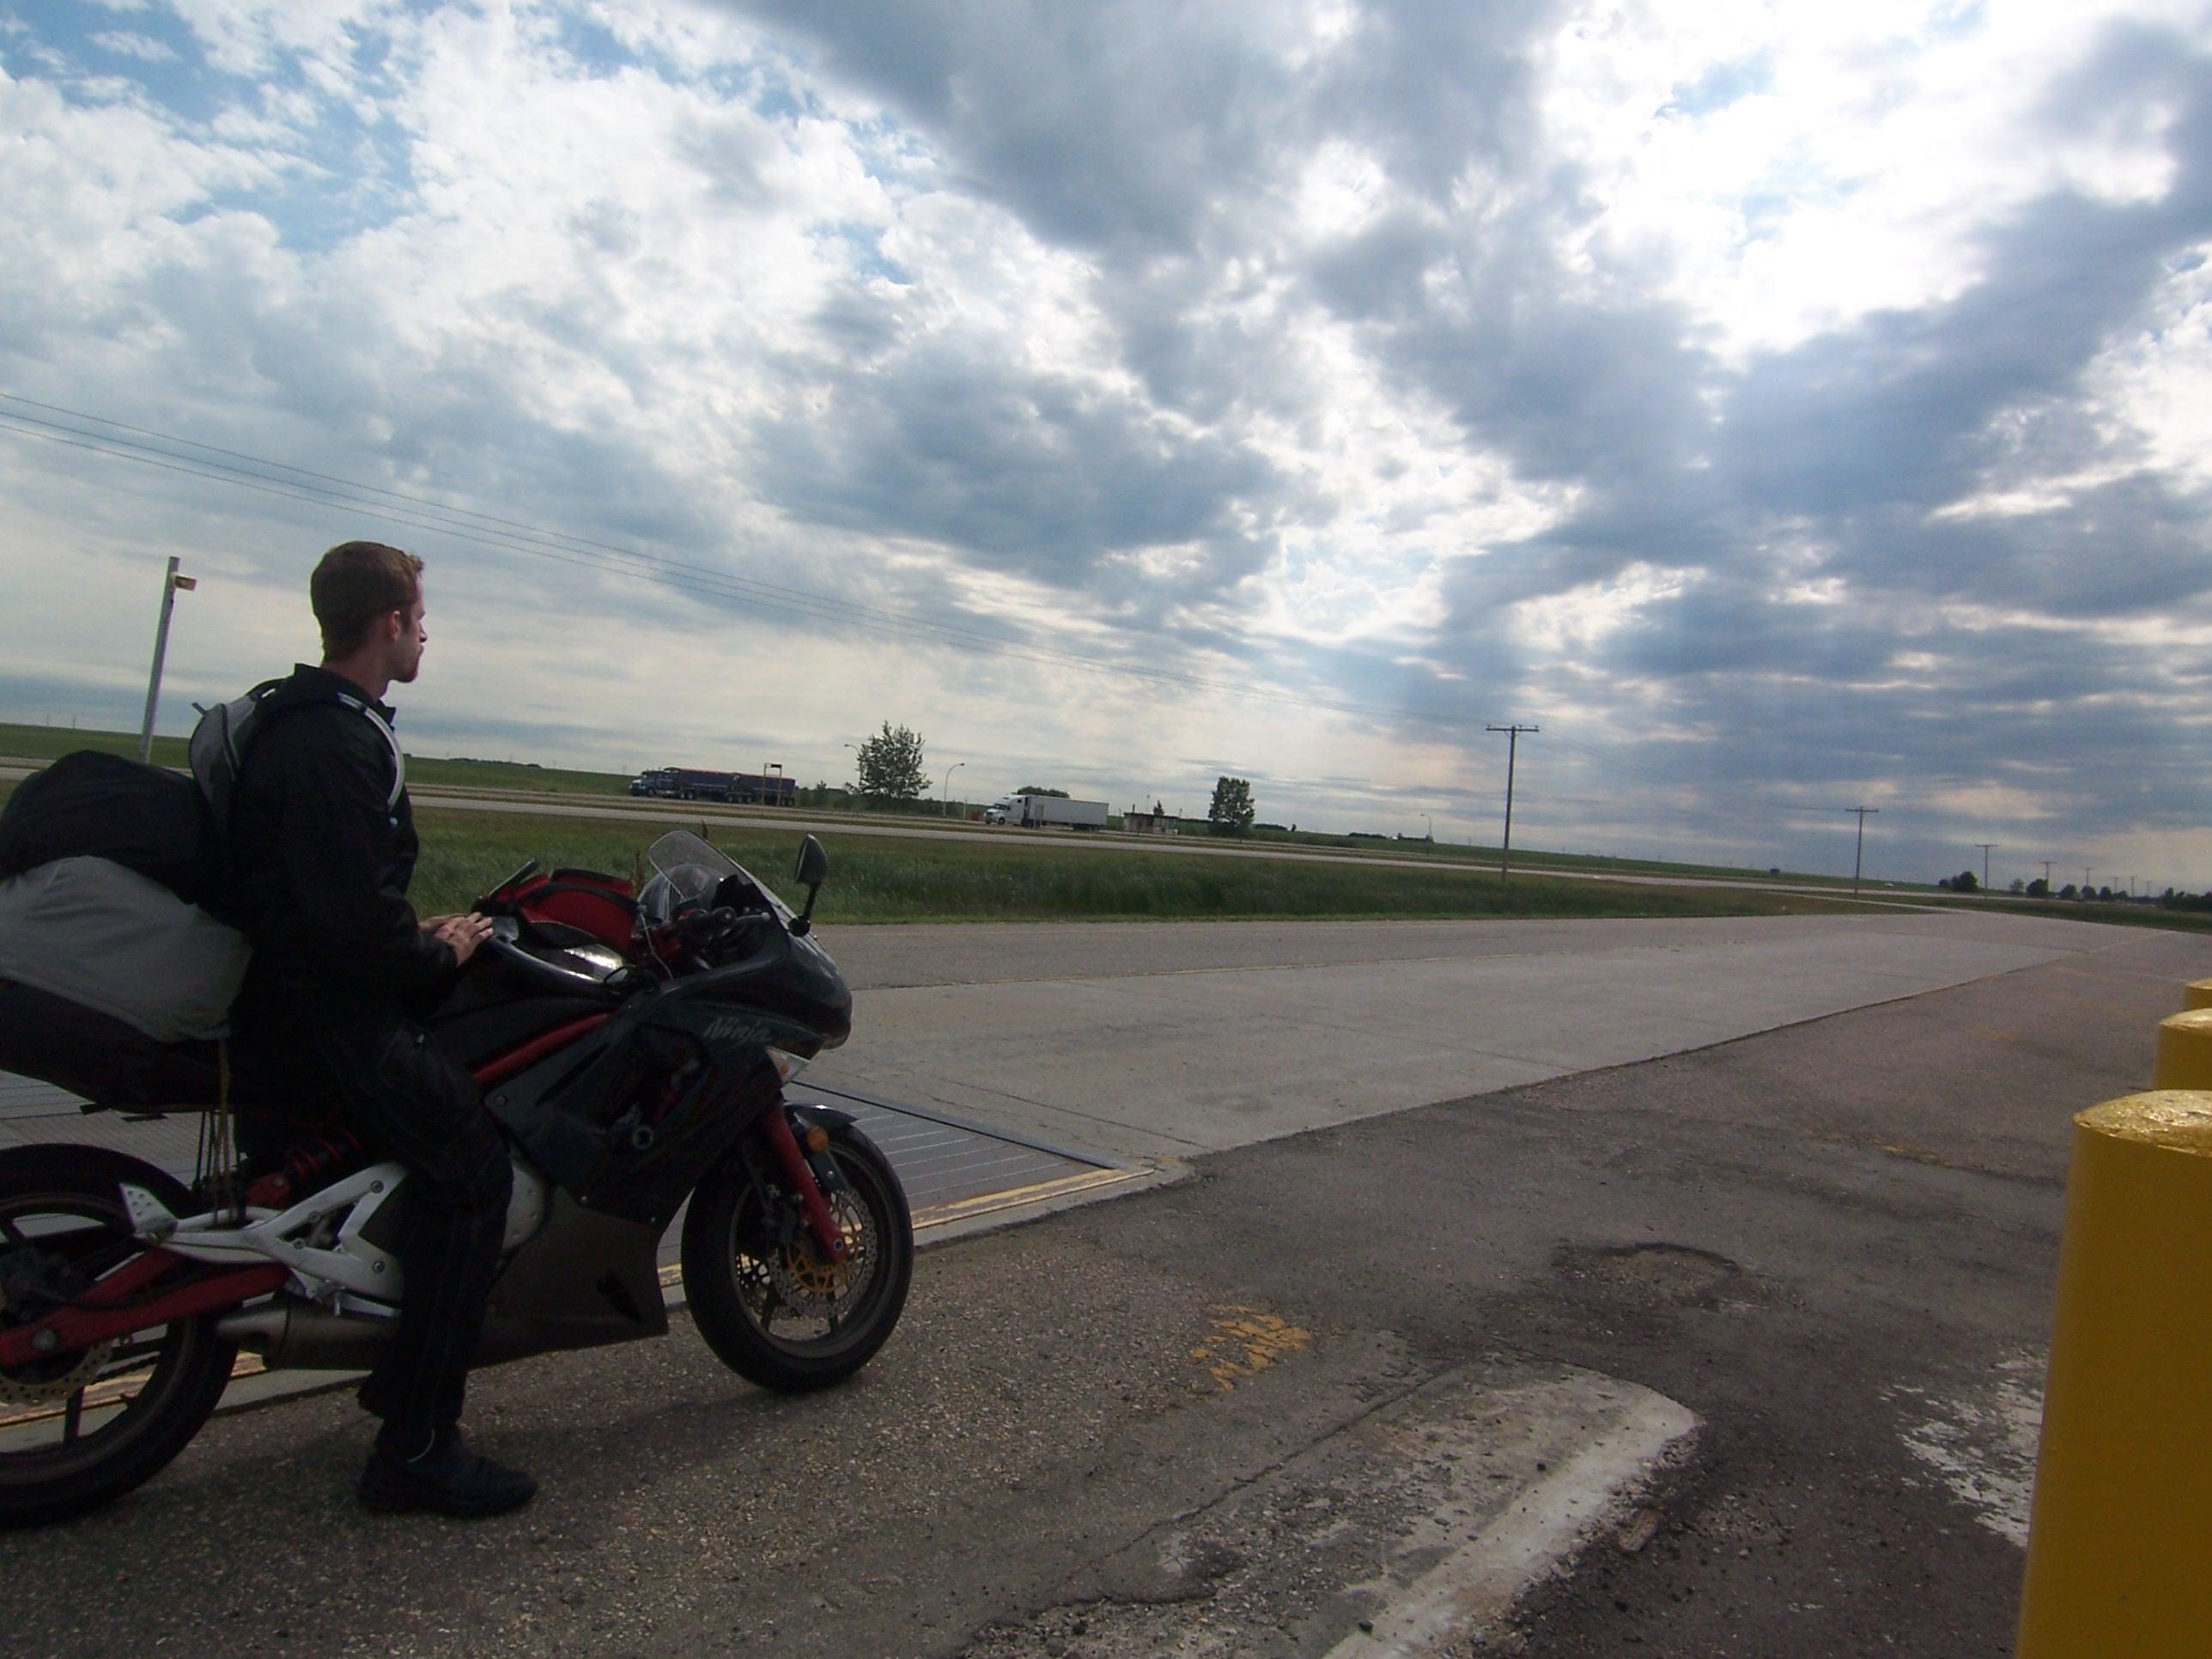 Saskatchewan Skies